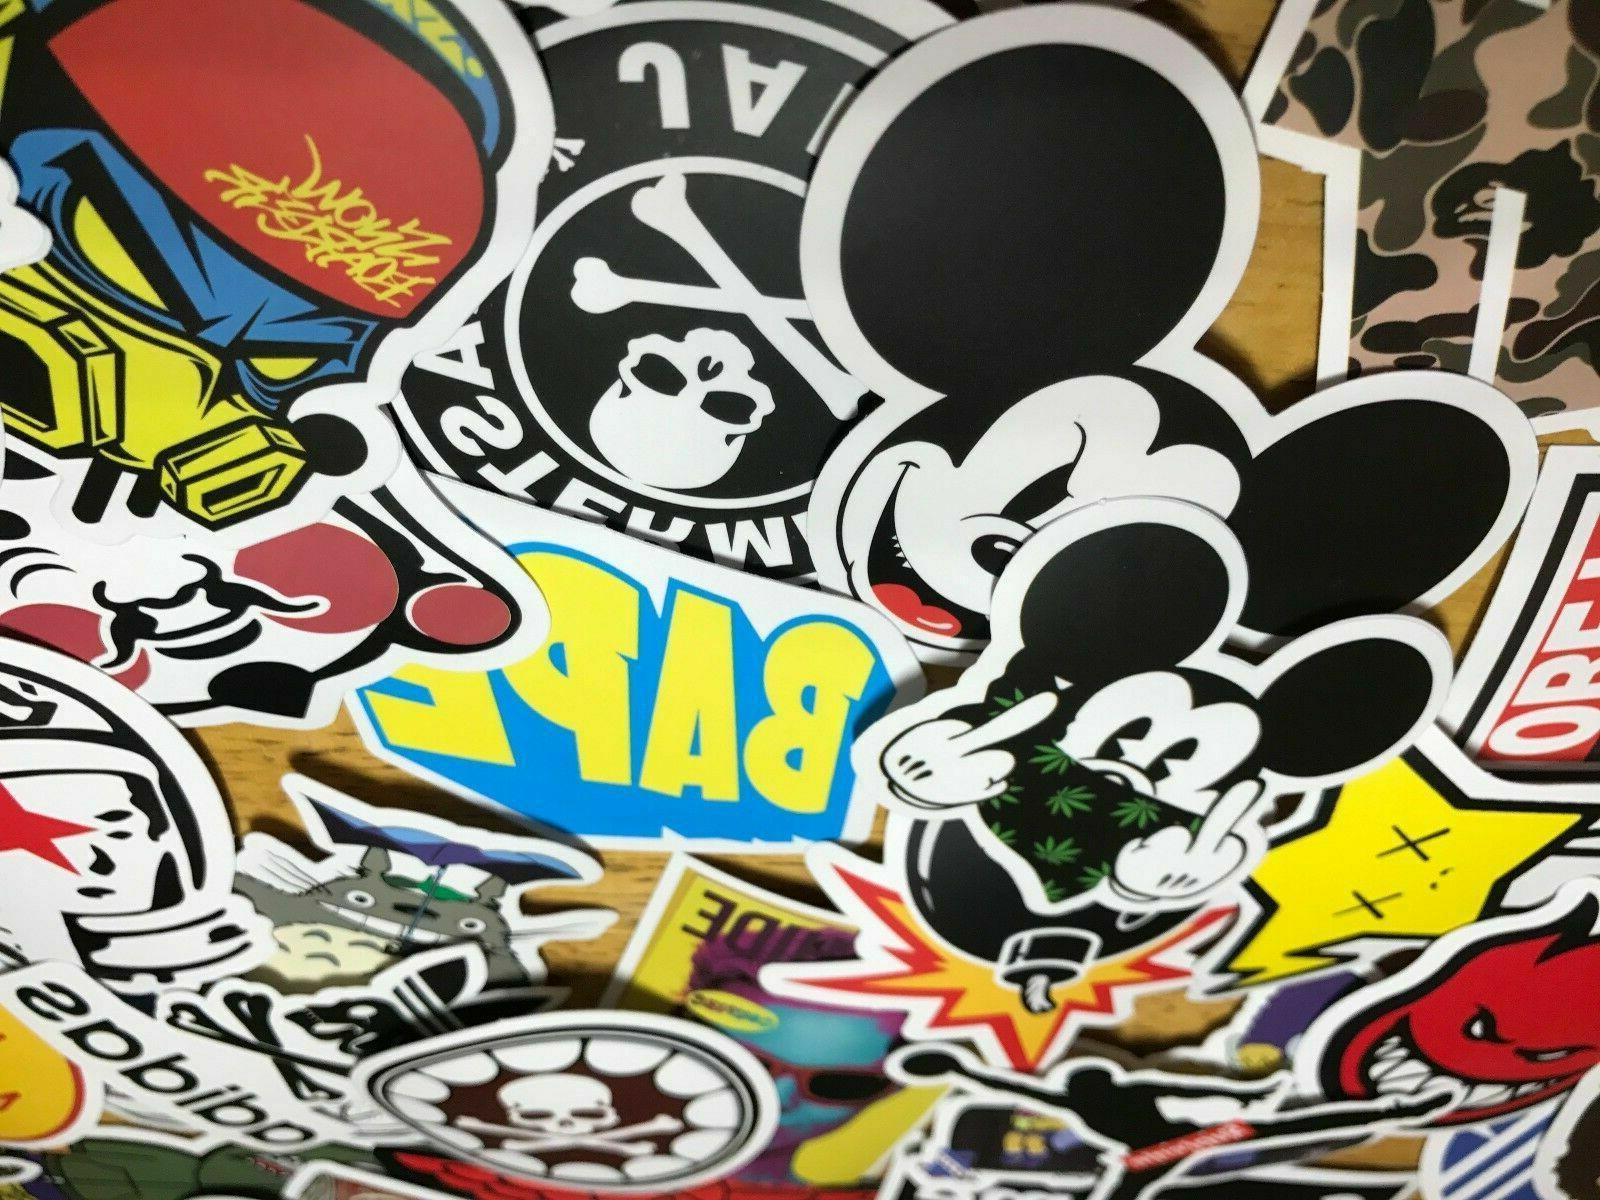 300 Skateboard Vinyl Luggage Dope